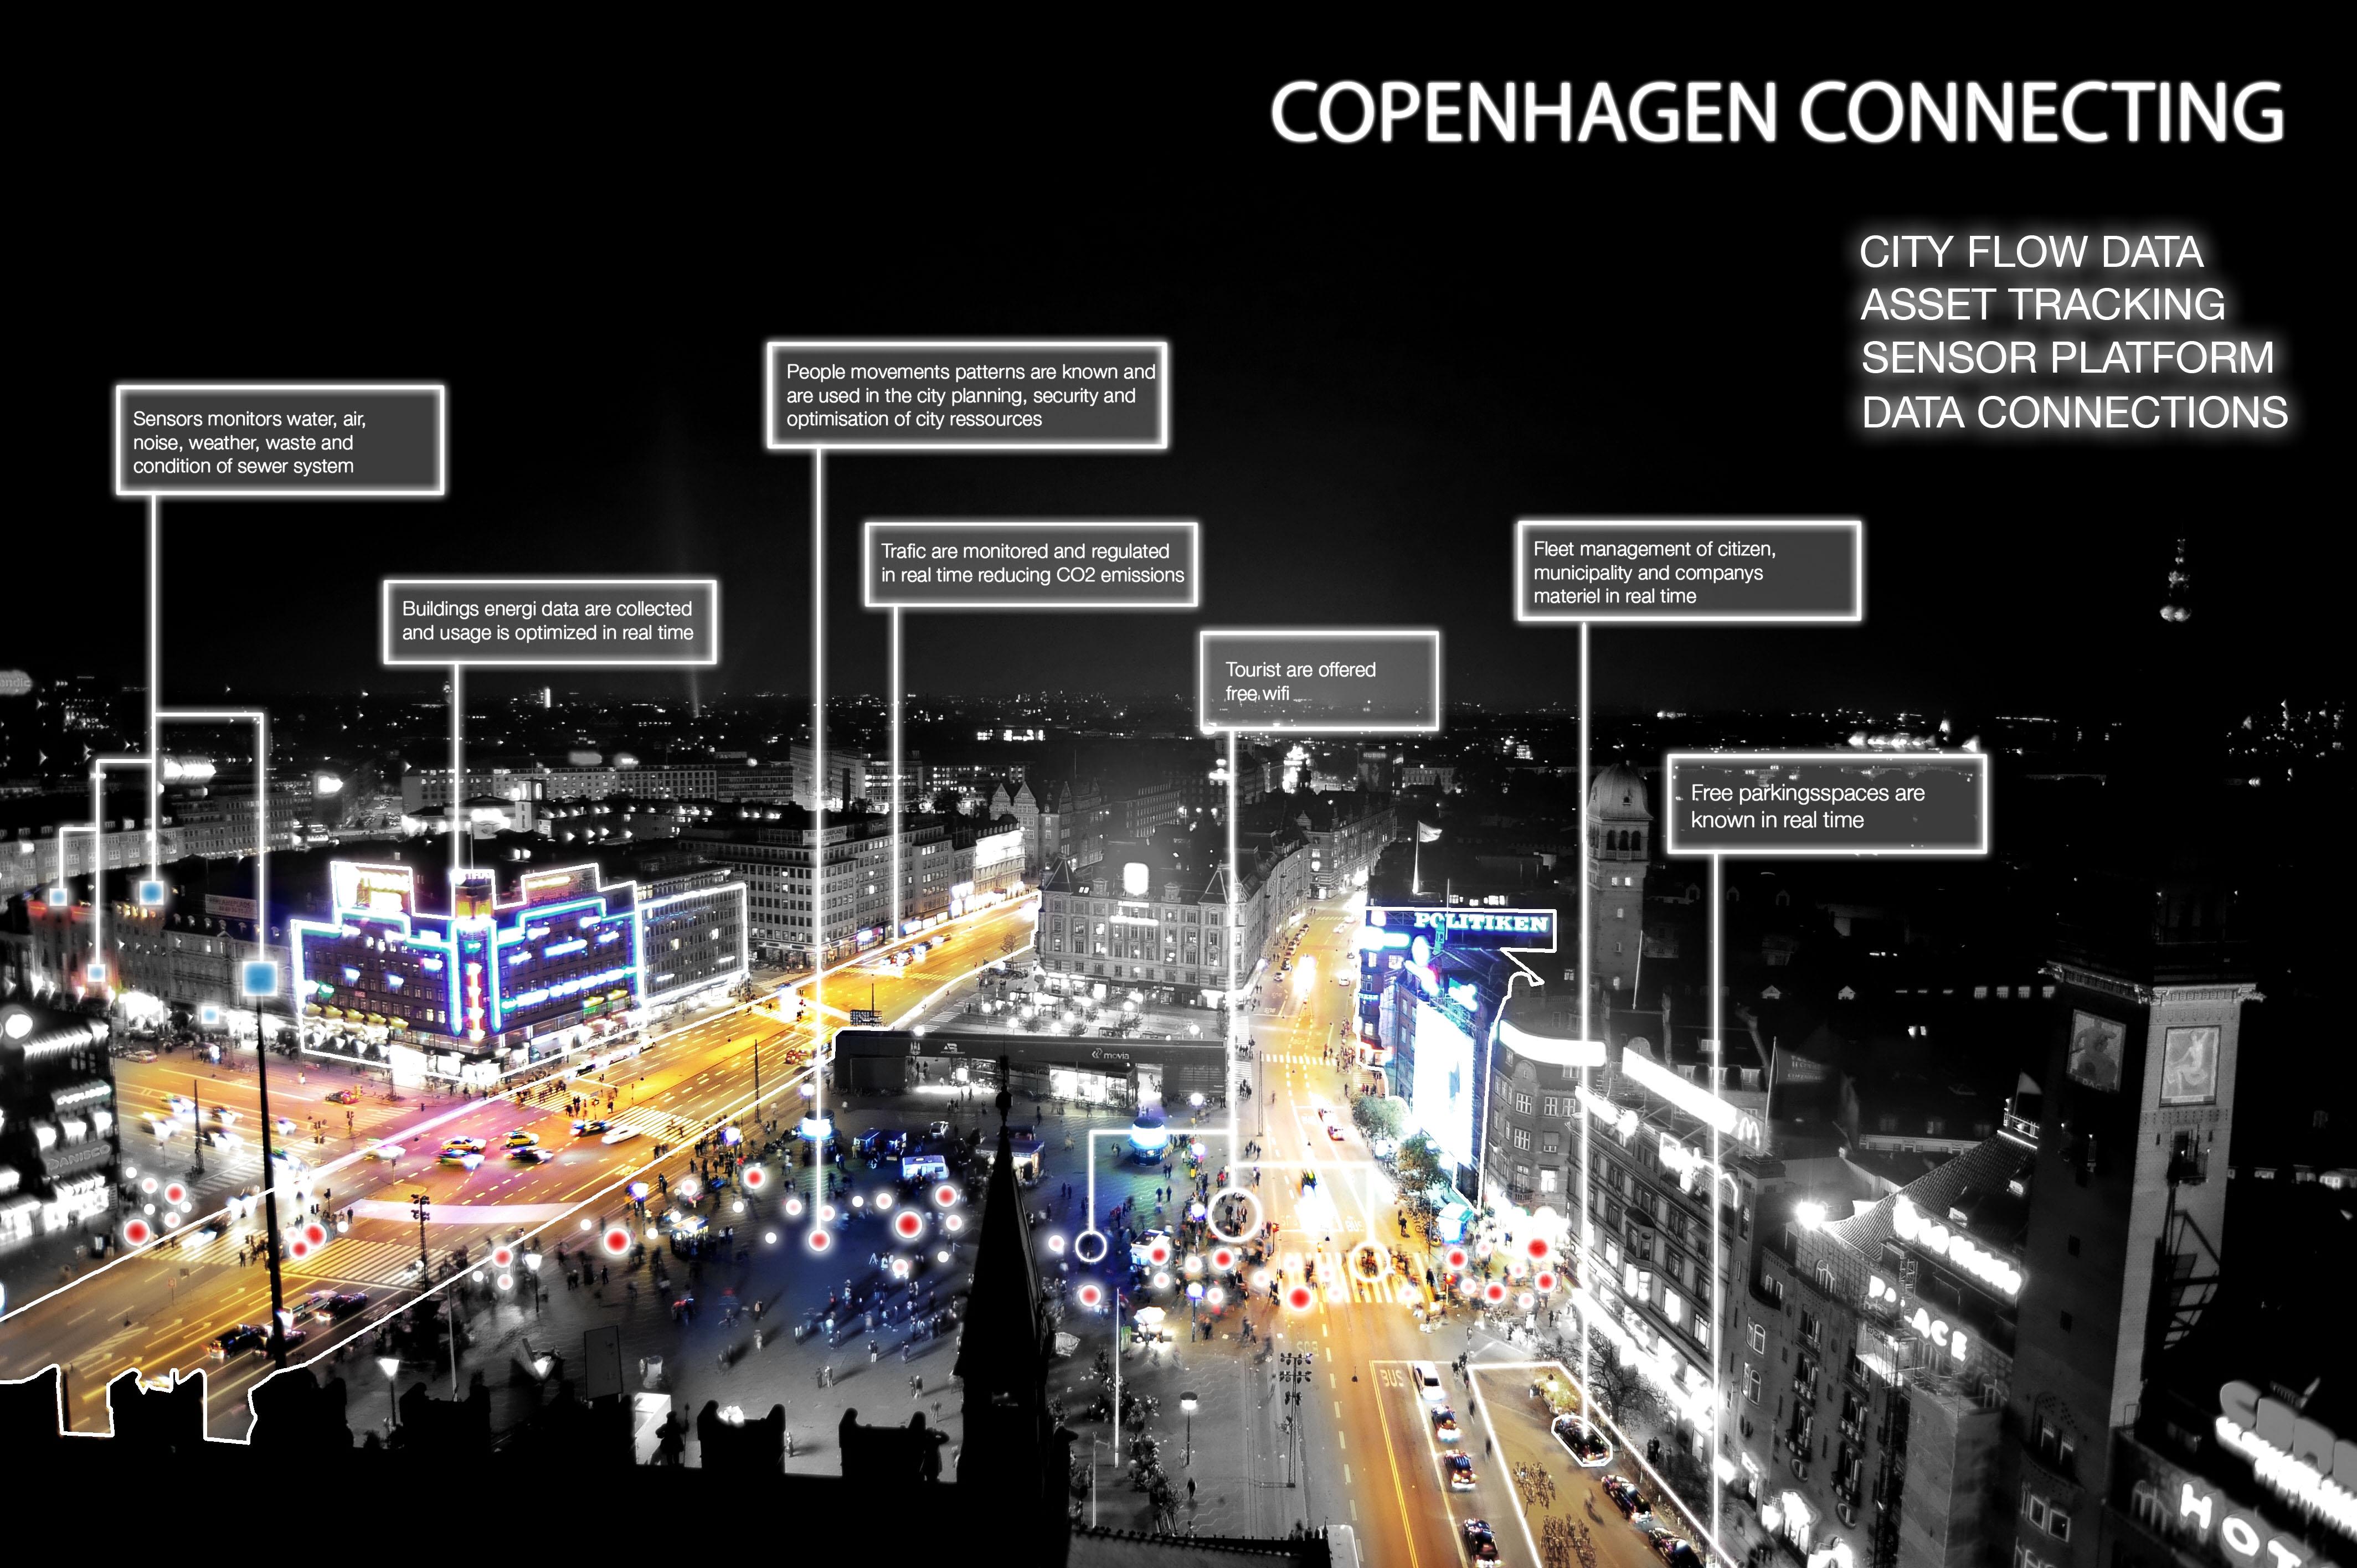 Copenhagen Capacity: smart city of the future